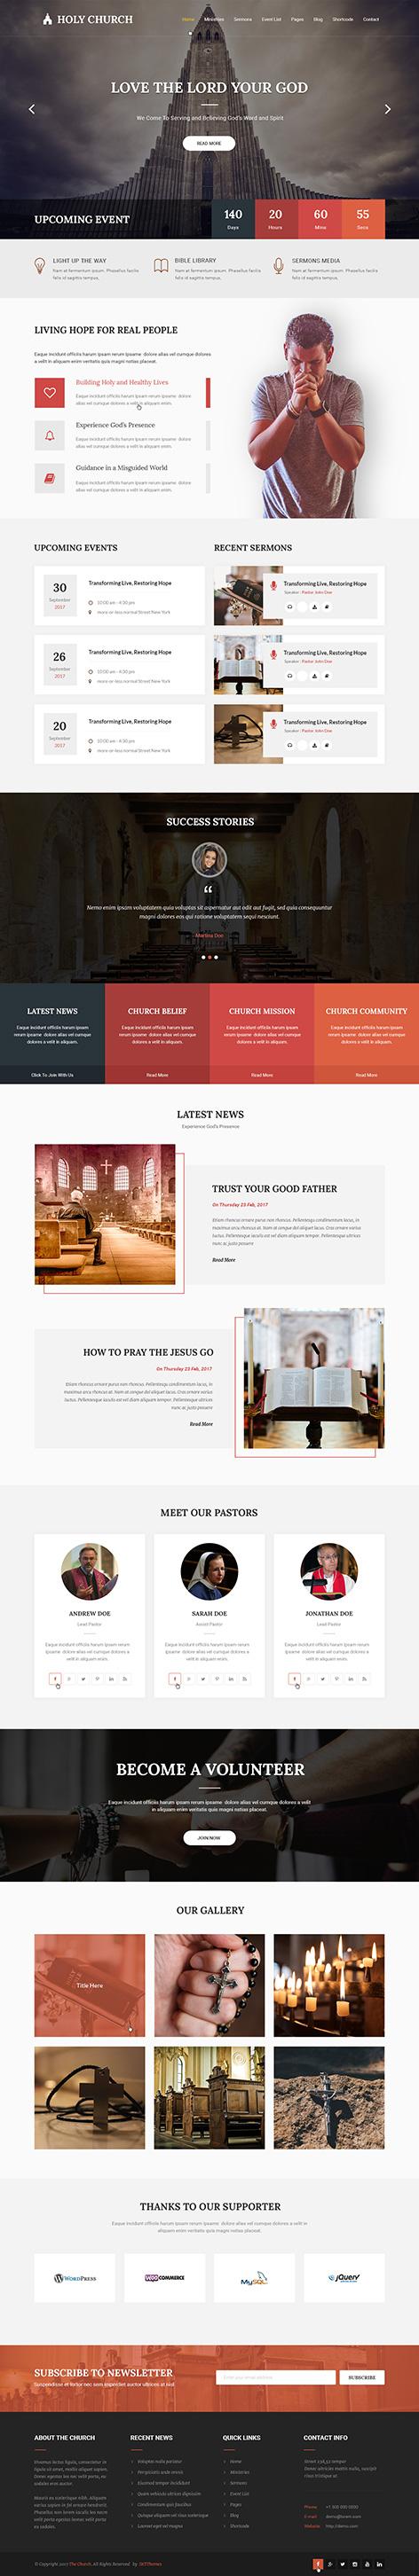 spiritual wordpress theme1 - Church